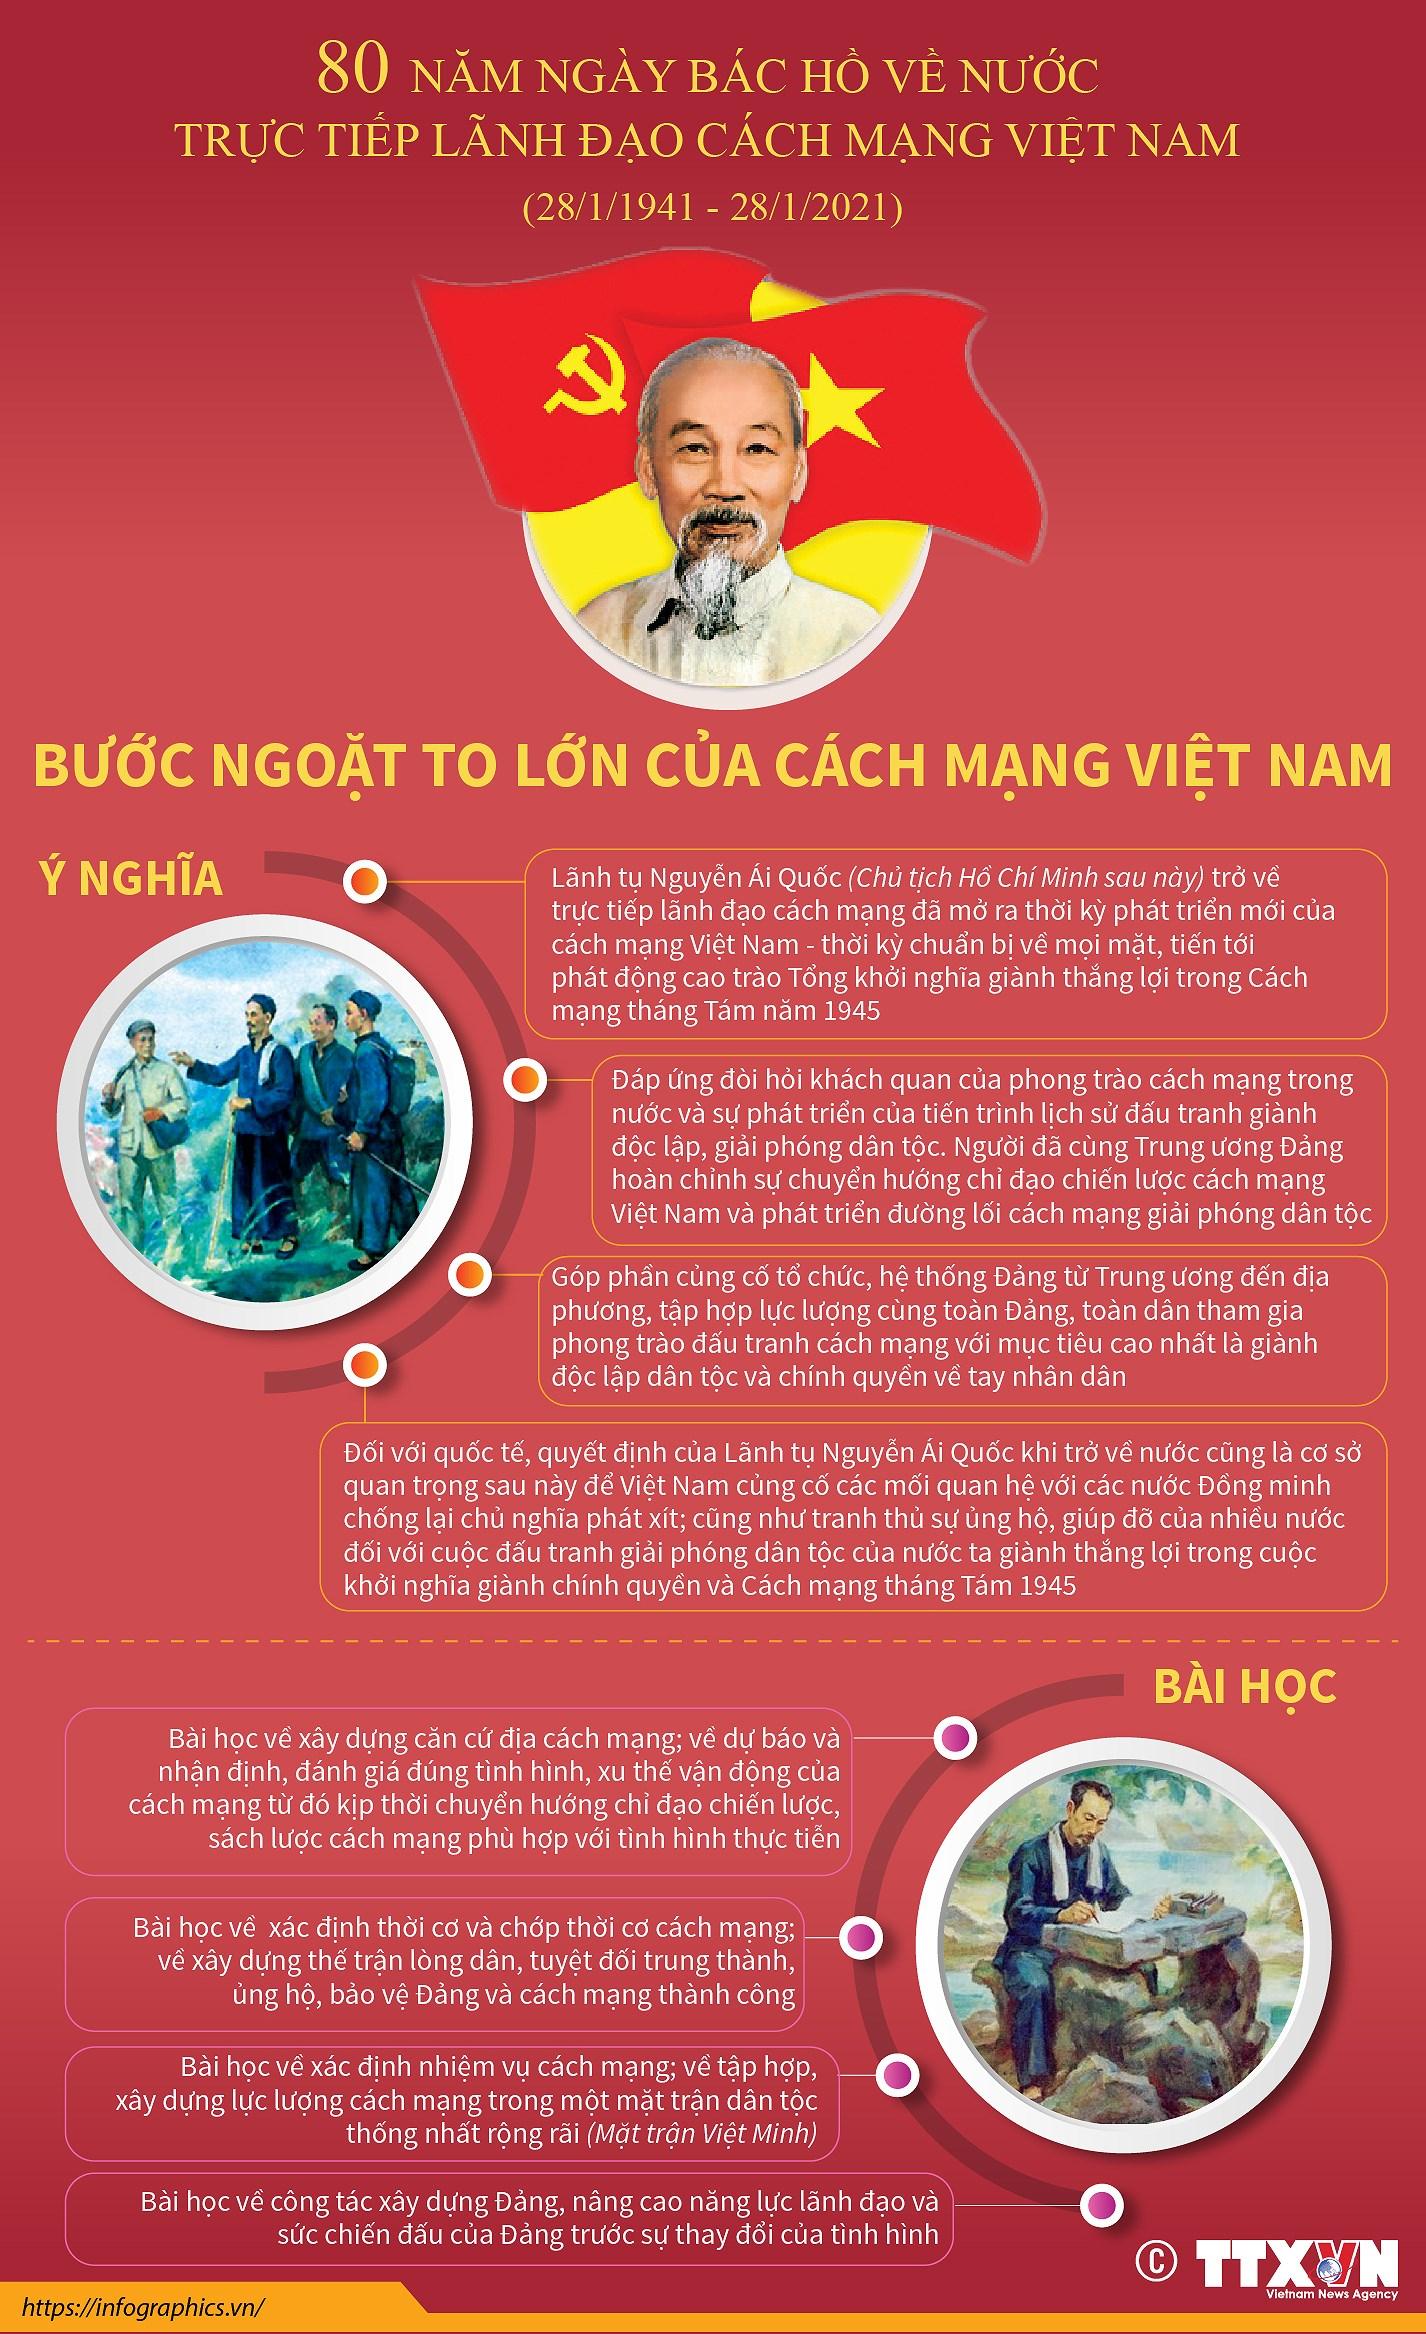 80 nam Ngay Bac Ho ve nuoc: Buoc ngoat cua cach mang Viet Nam hinh anh 1